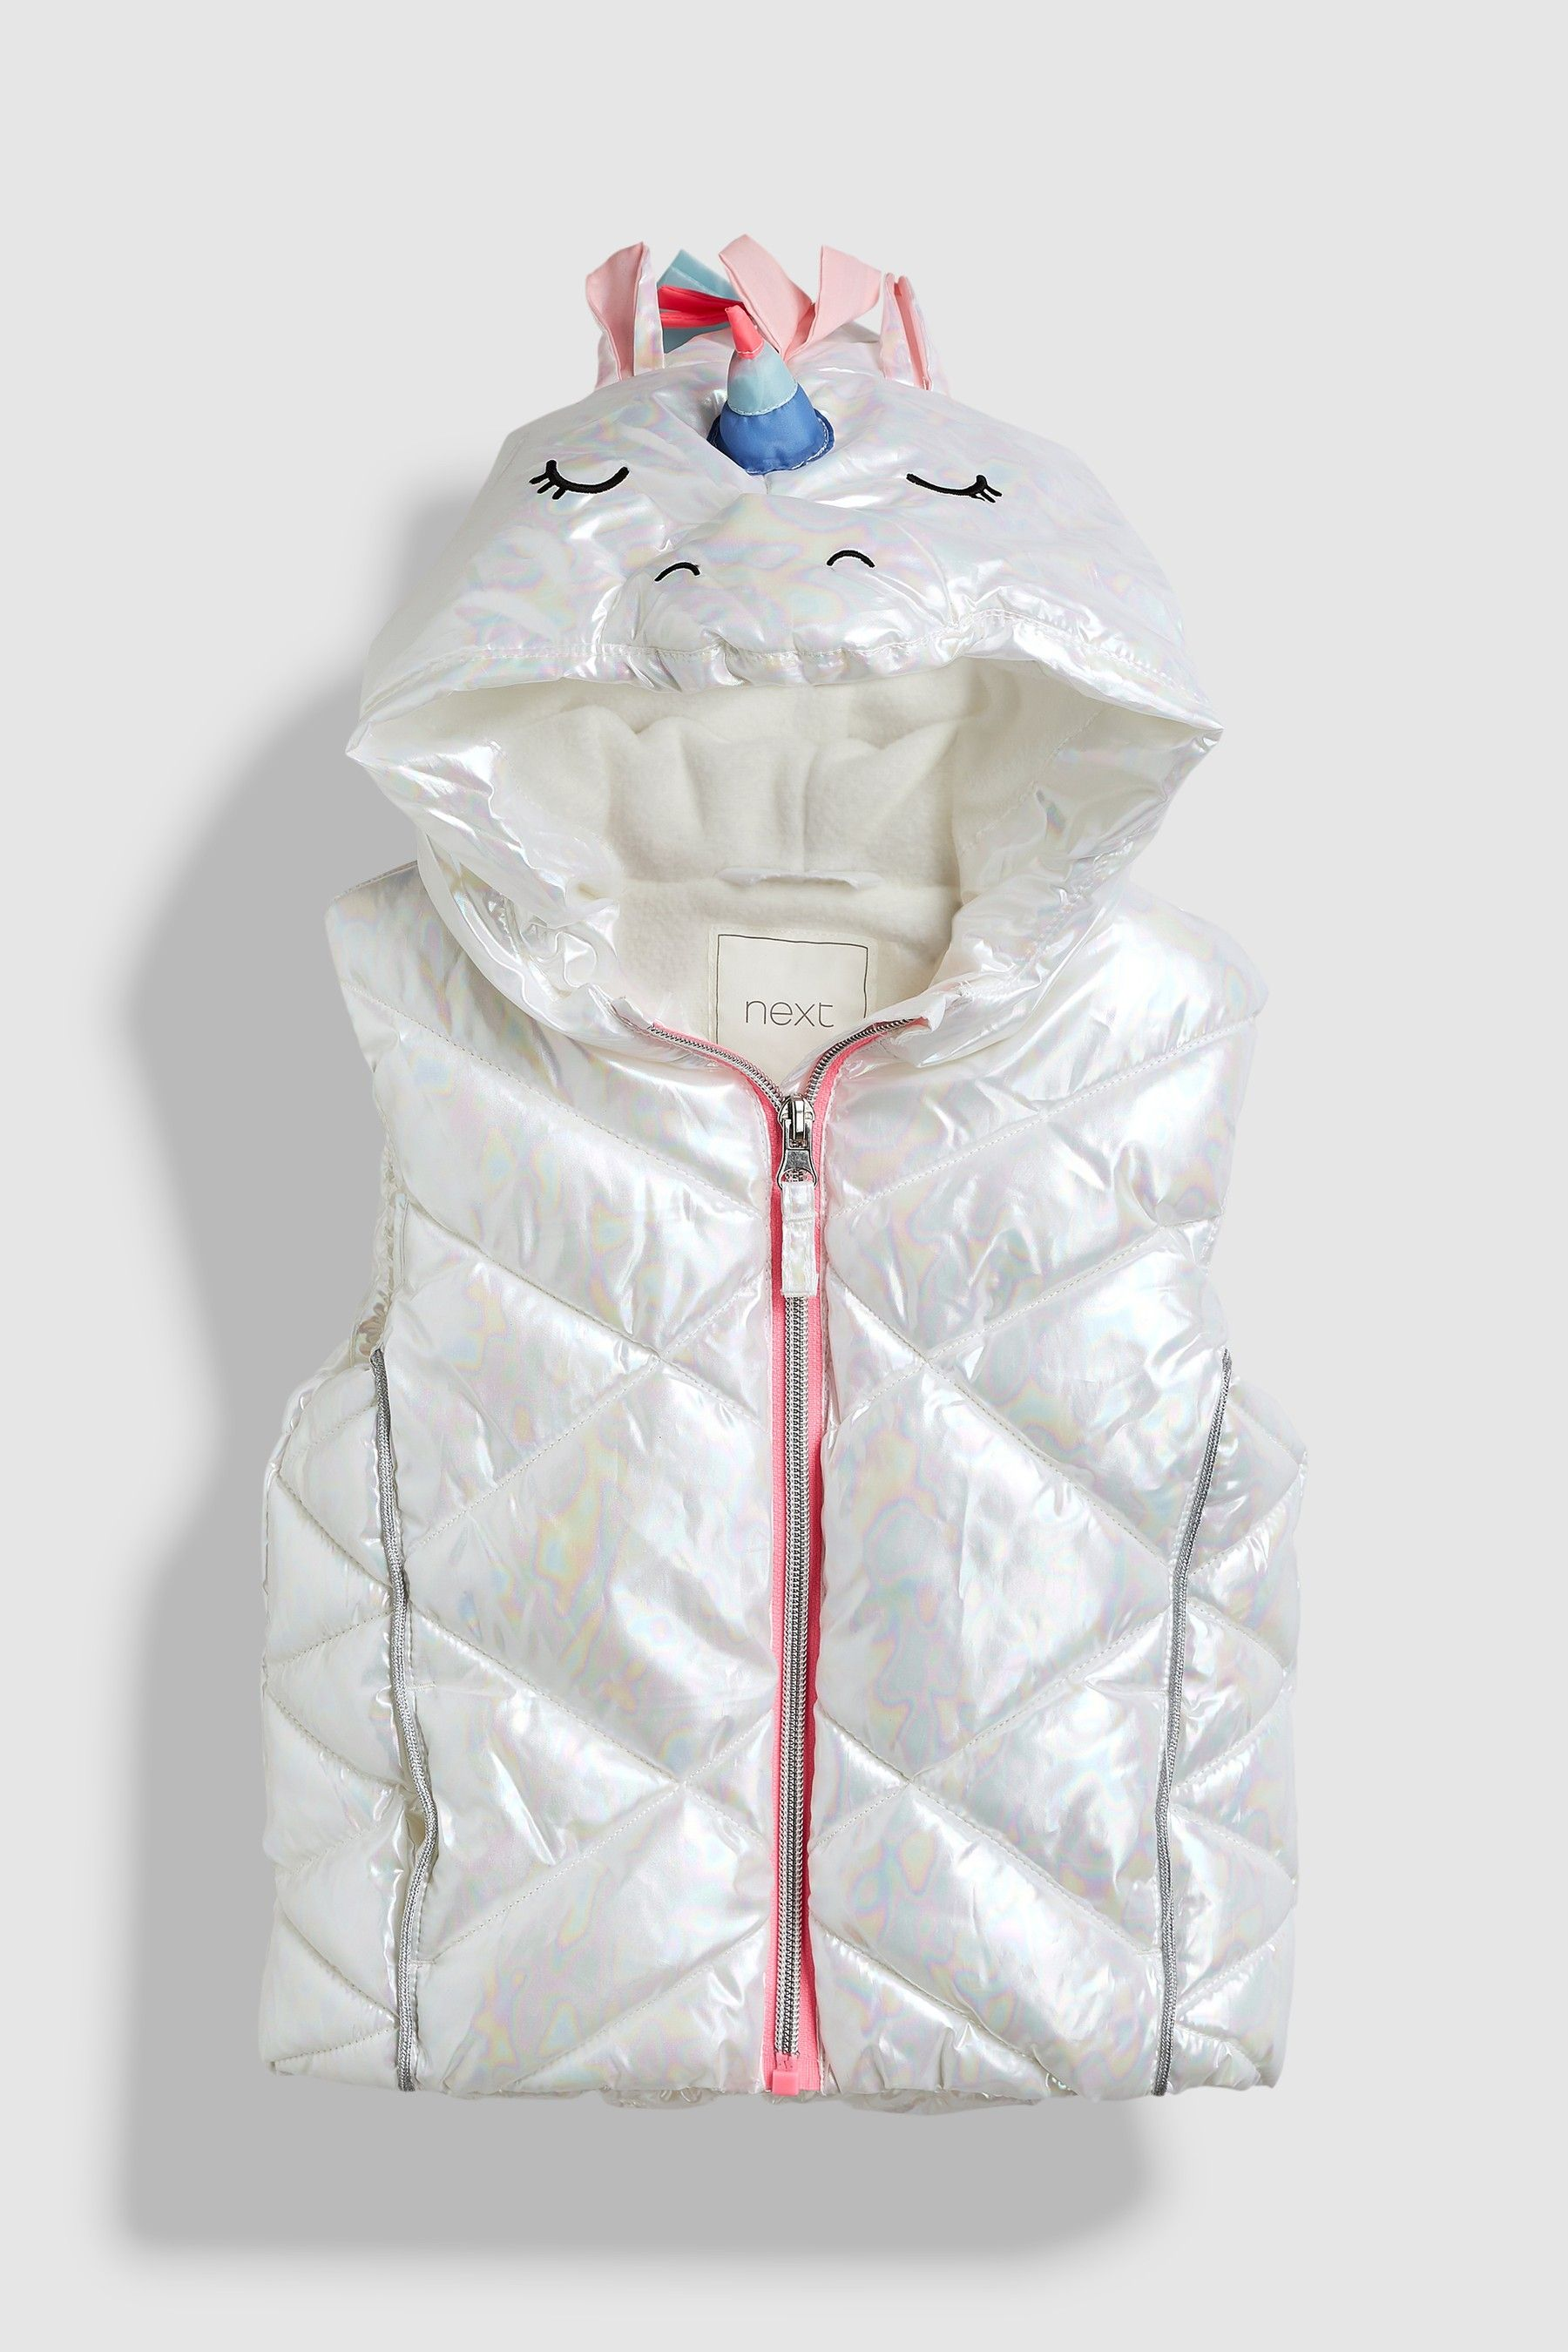 b009e9f469eb Girls Next White Unicorn Gilet (3mths-6yrs) - White | Products ...